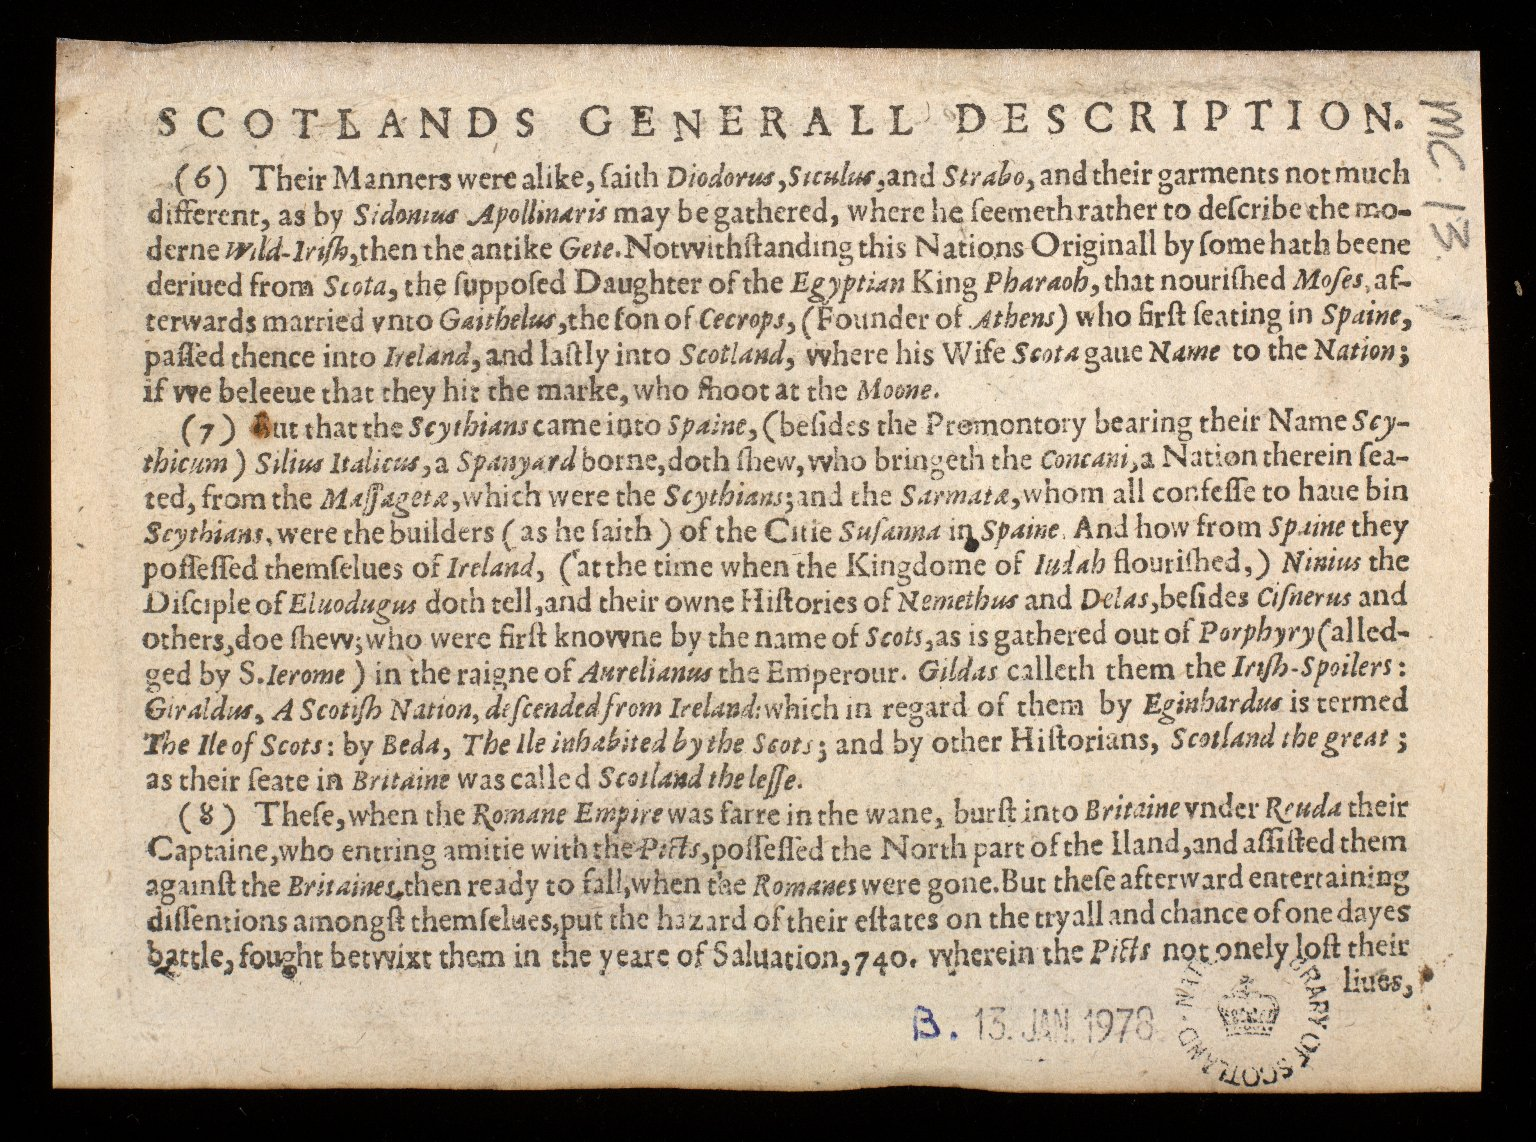 The Southren [sic] parte of Scotland, wherin is ye strange Lake Lomund [2 of 2]